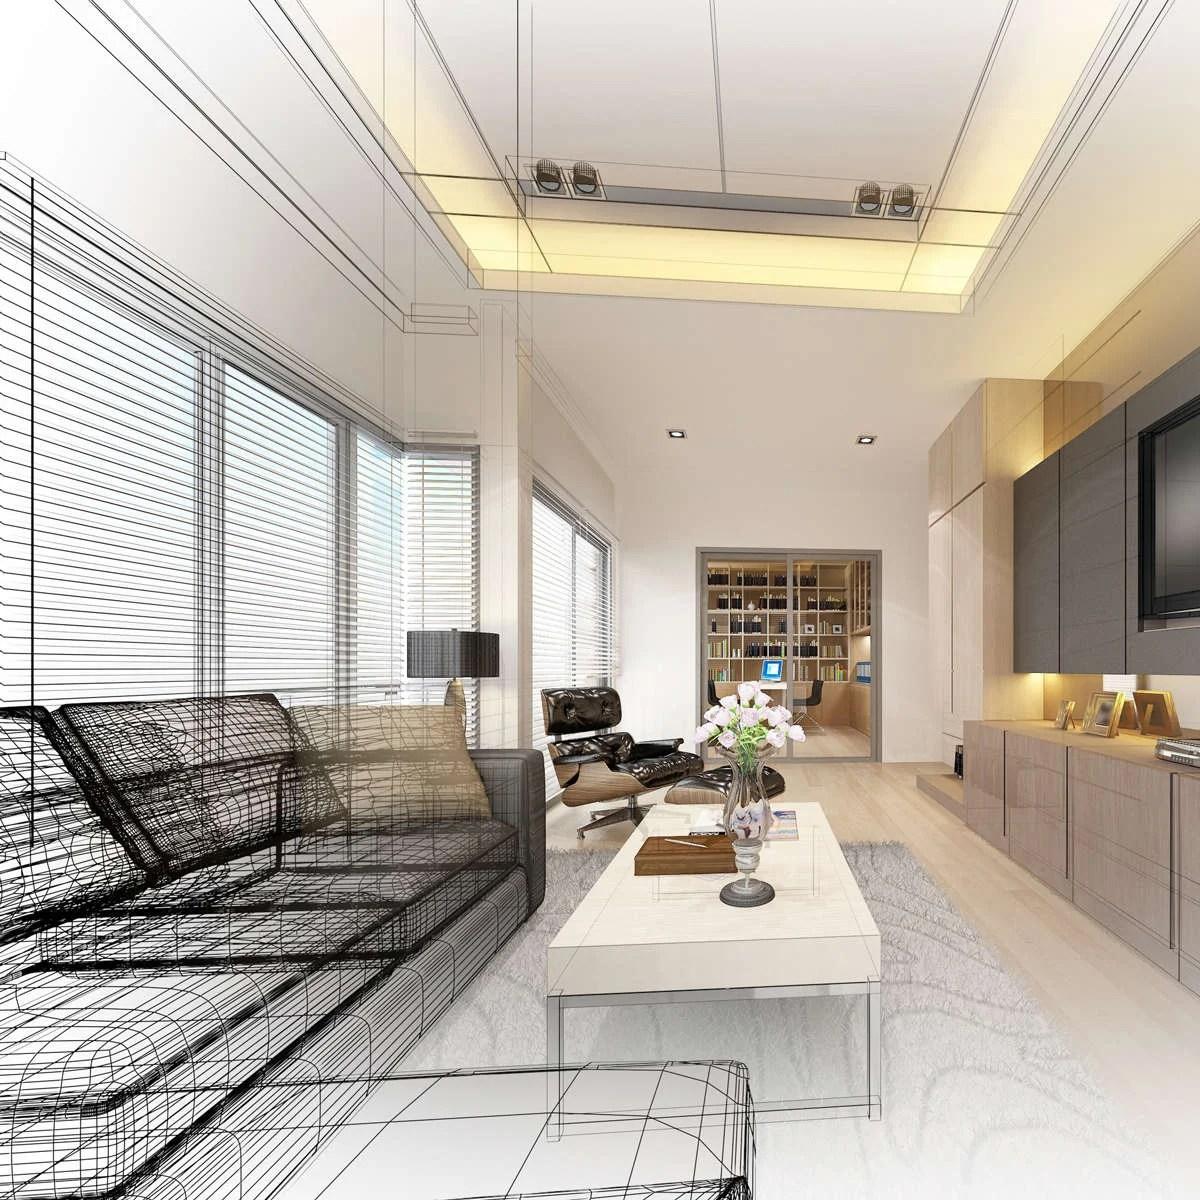 Home Design Ideas Hong Kong: Kitchen Interior Design Hong Kong